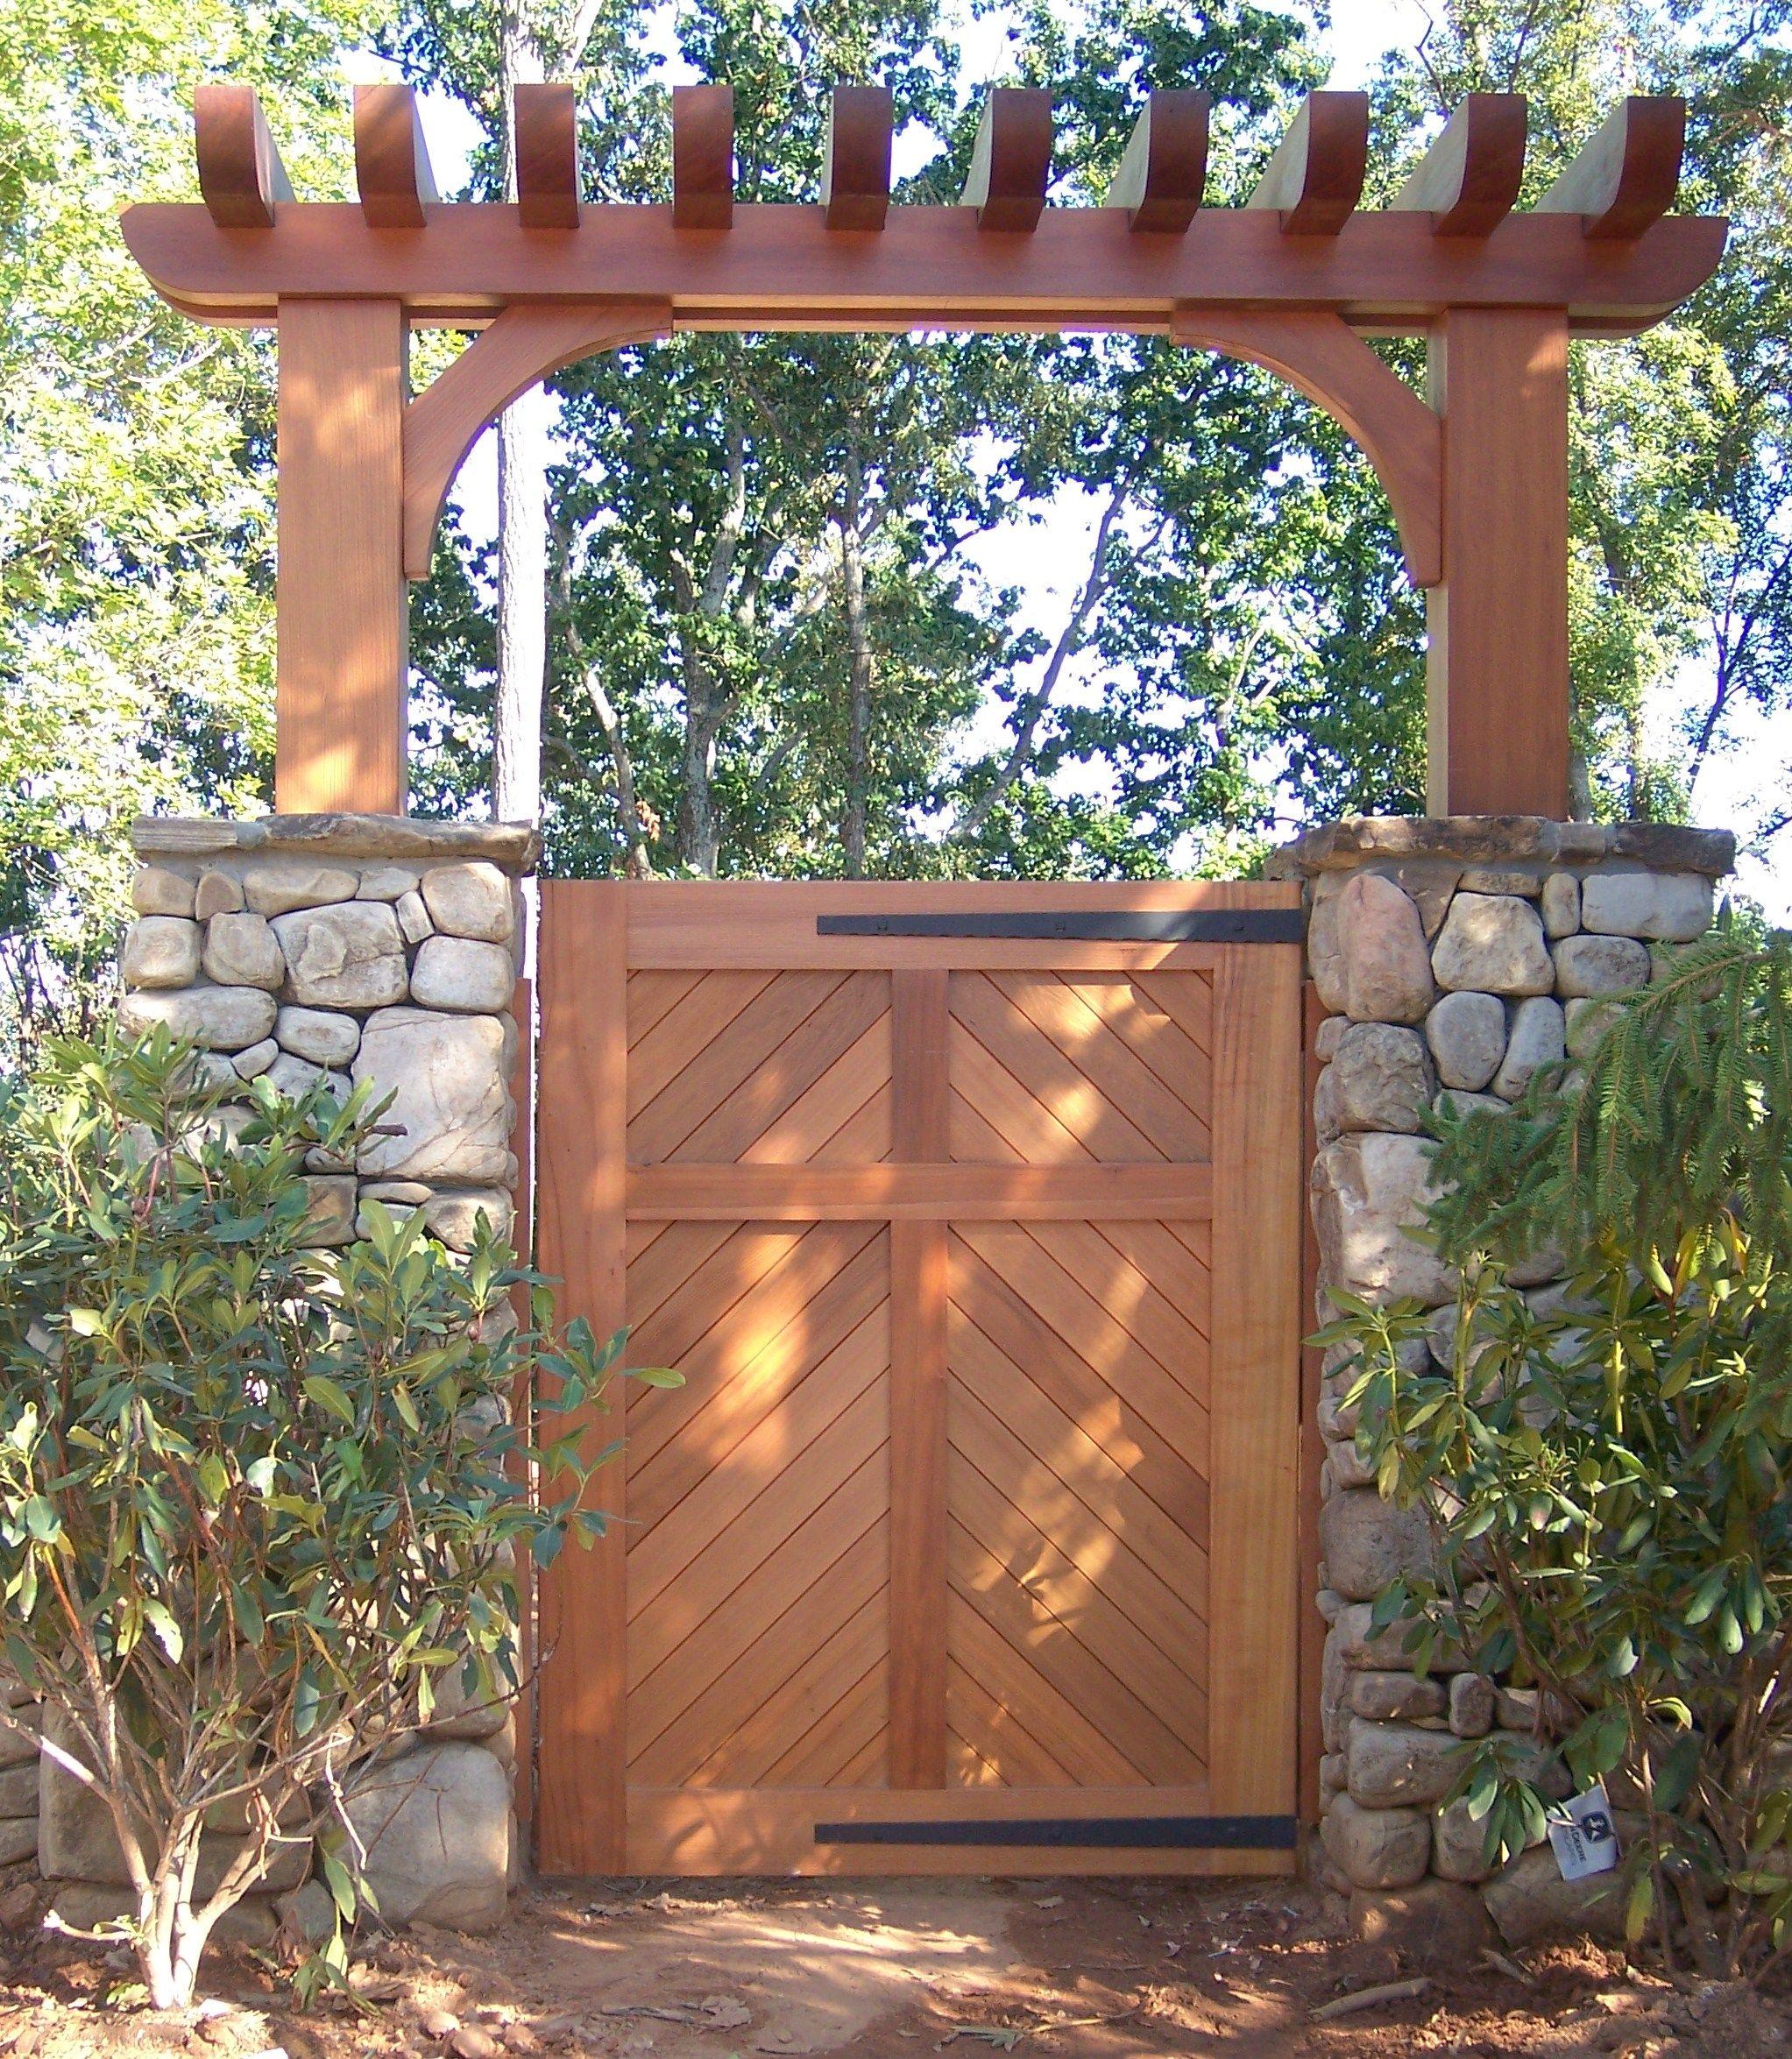 Fence Gate Arbor: Garden Trellis Designs, Garden